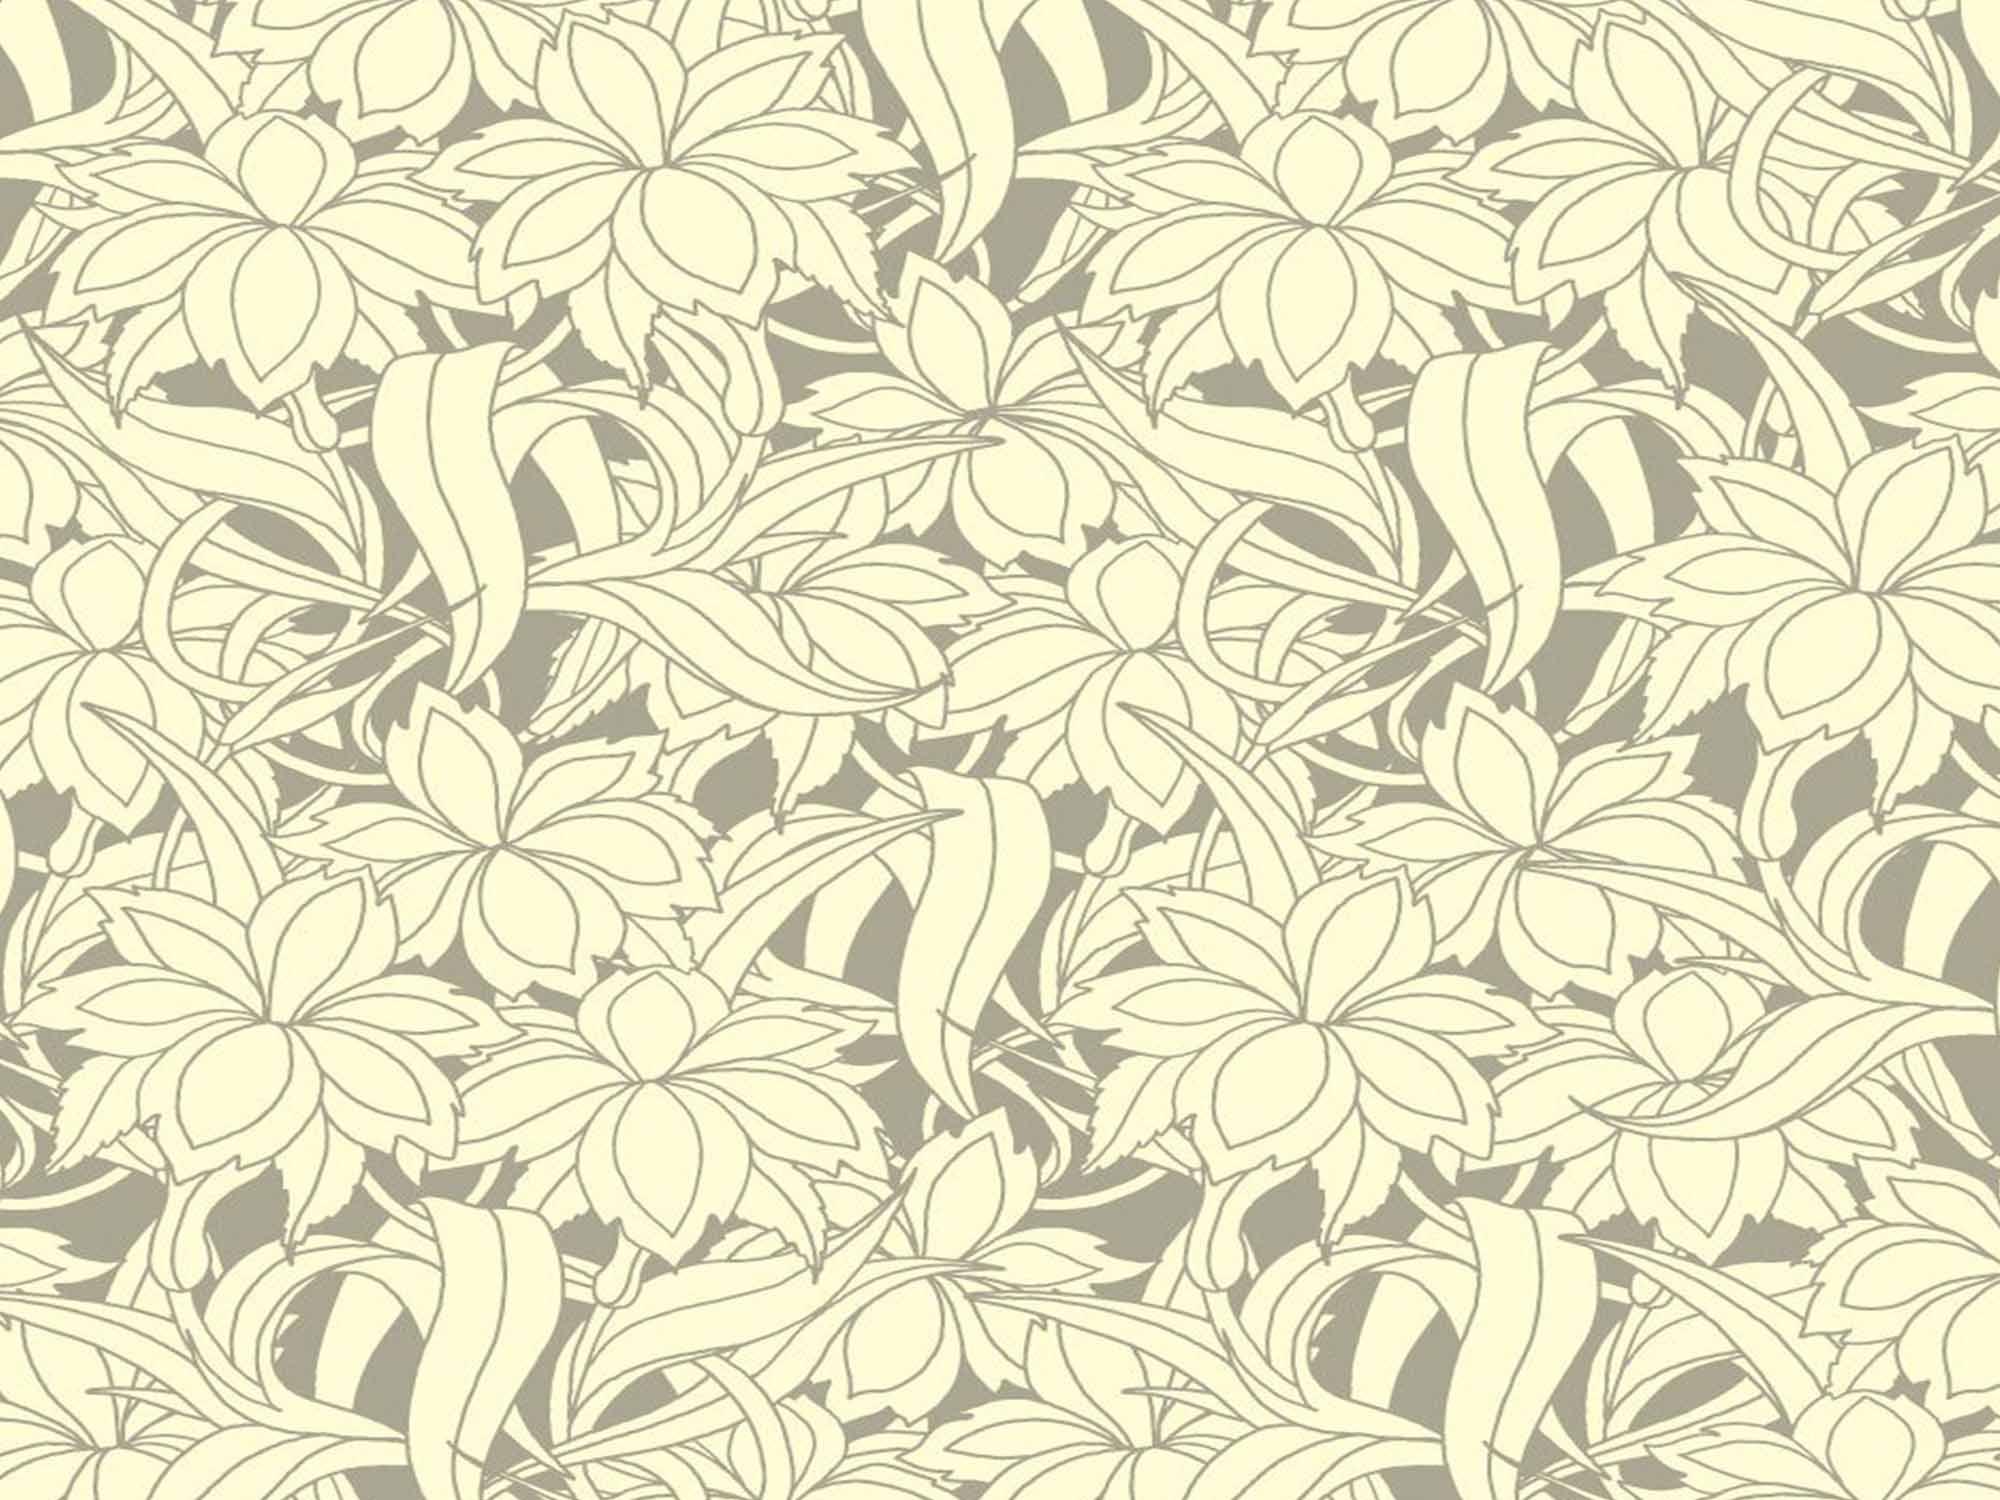 Papel de Parede Floral 0083 - Adesivos de Parede  - Paredes Decoradas